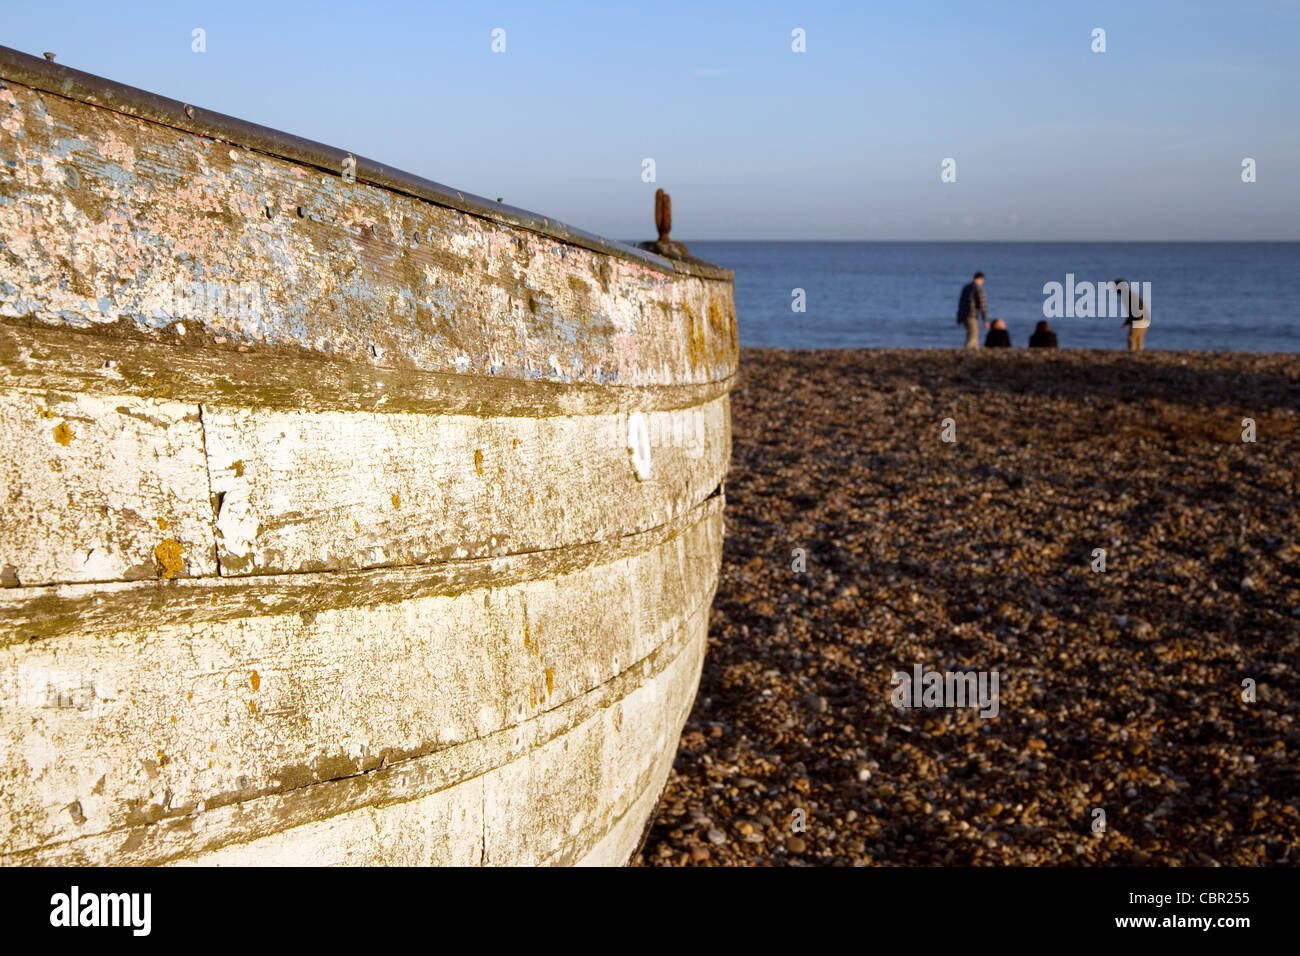 Rowing boat, Aldeburgh beach Suffolk UK - Stock Image